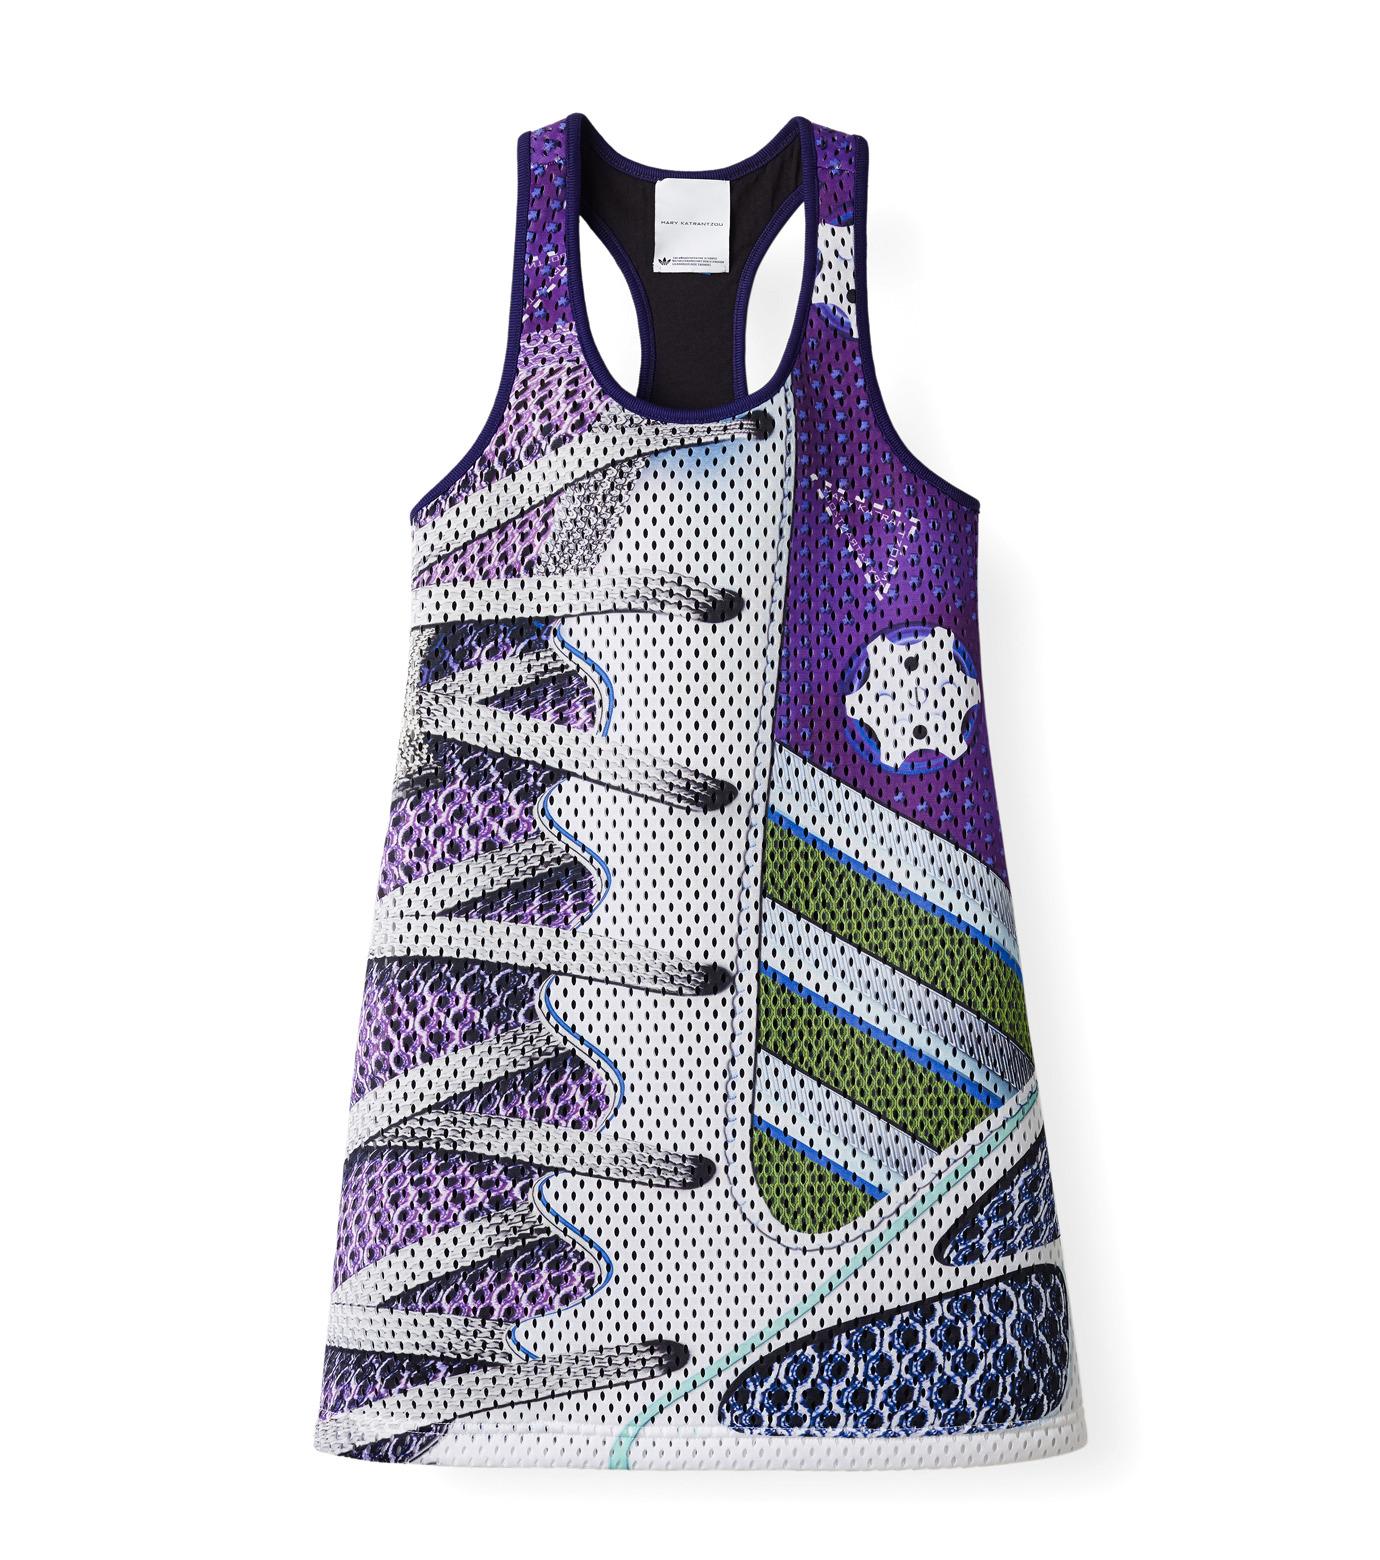 Adidas x Mary Katrantzou(アディダス メアリー・カトランズ)のTank Dress-PURPLE(ドレス/dress)-M62620-82 拡大詳細画像1